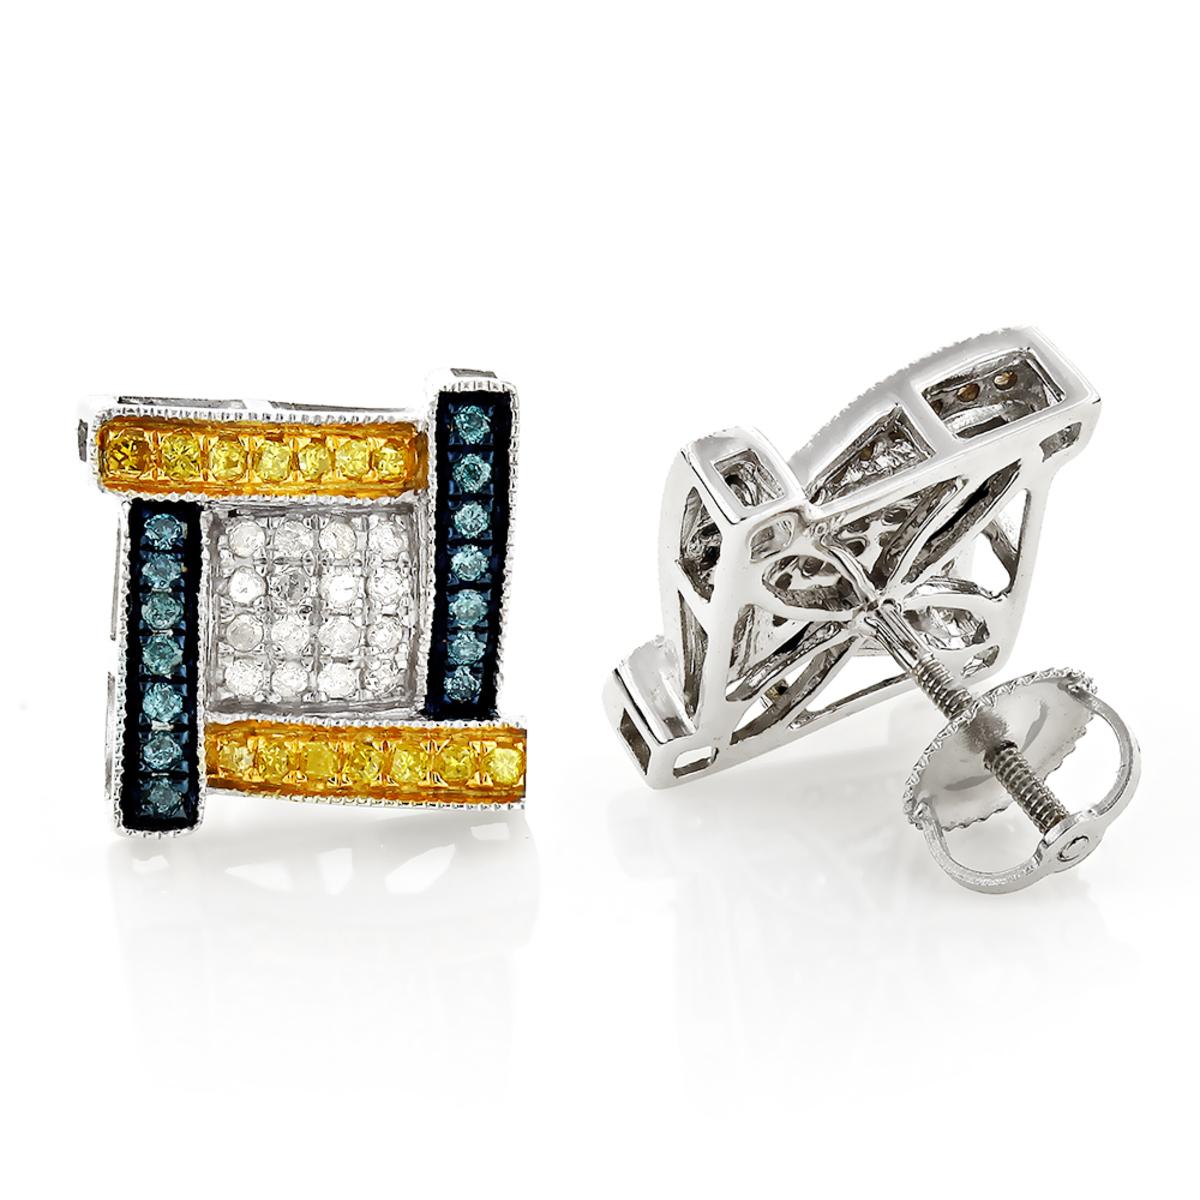 White Yellow Blue Diamond Earrings 0.5ct 10K Gold